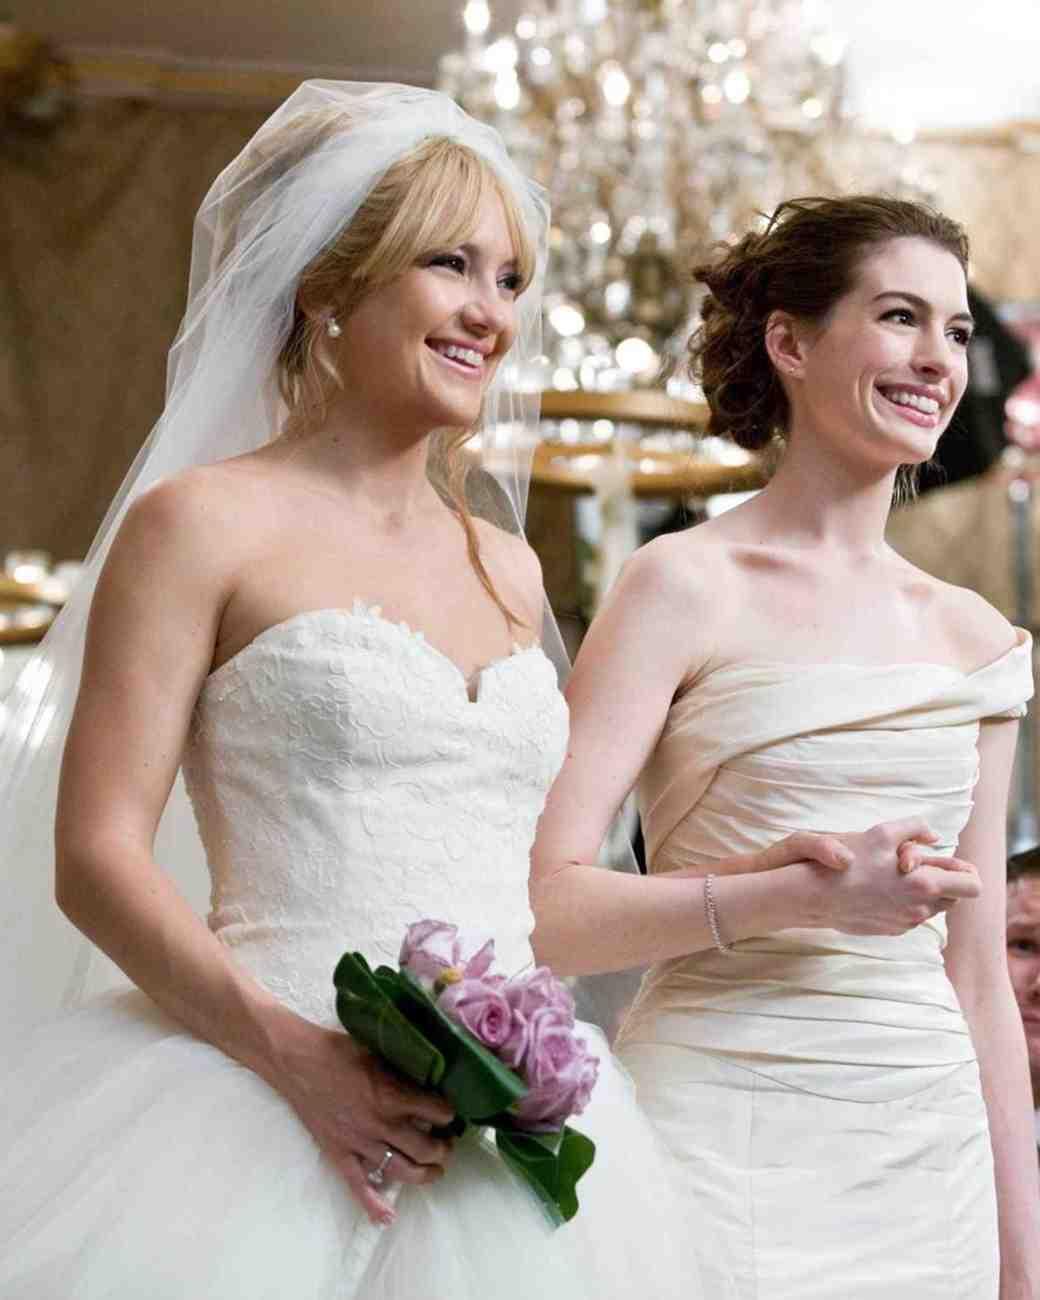 bride-wars-wedding-dress-0515